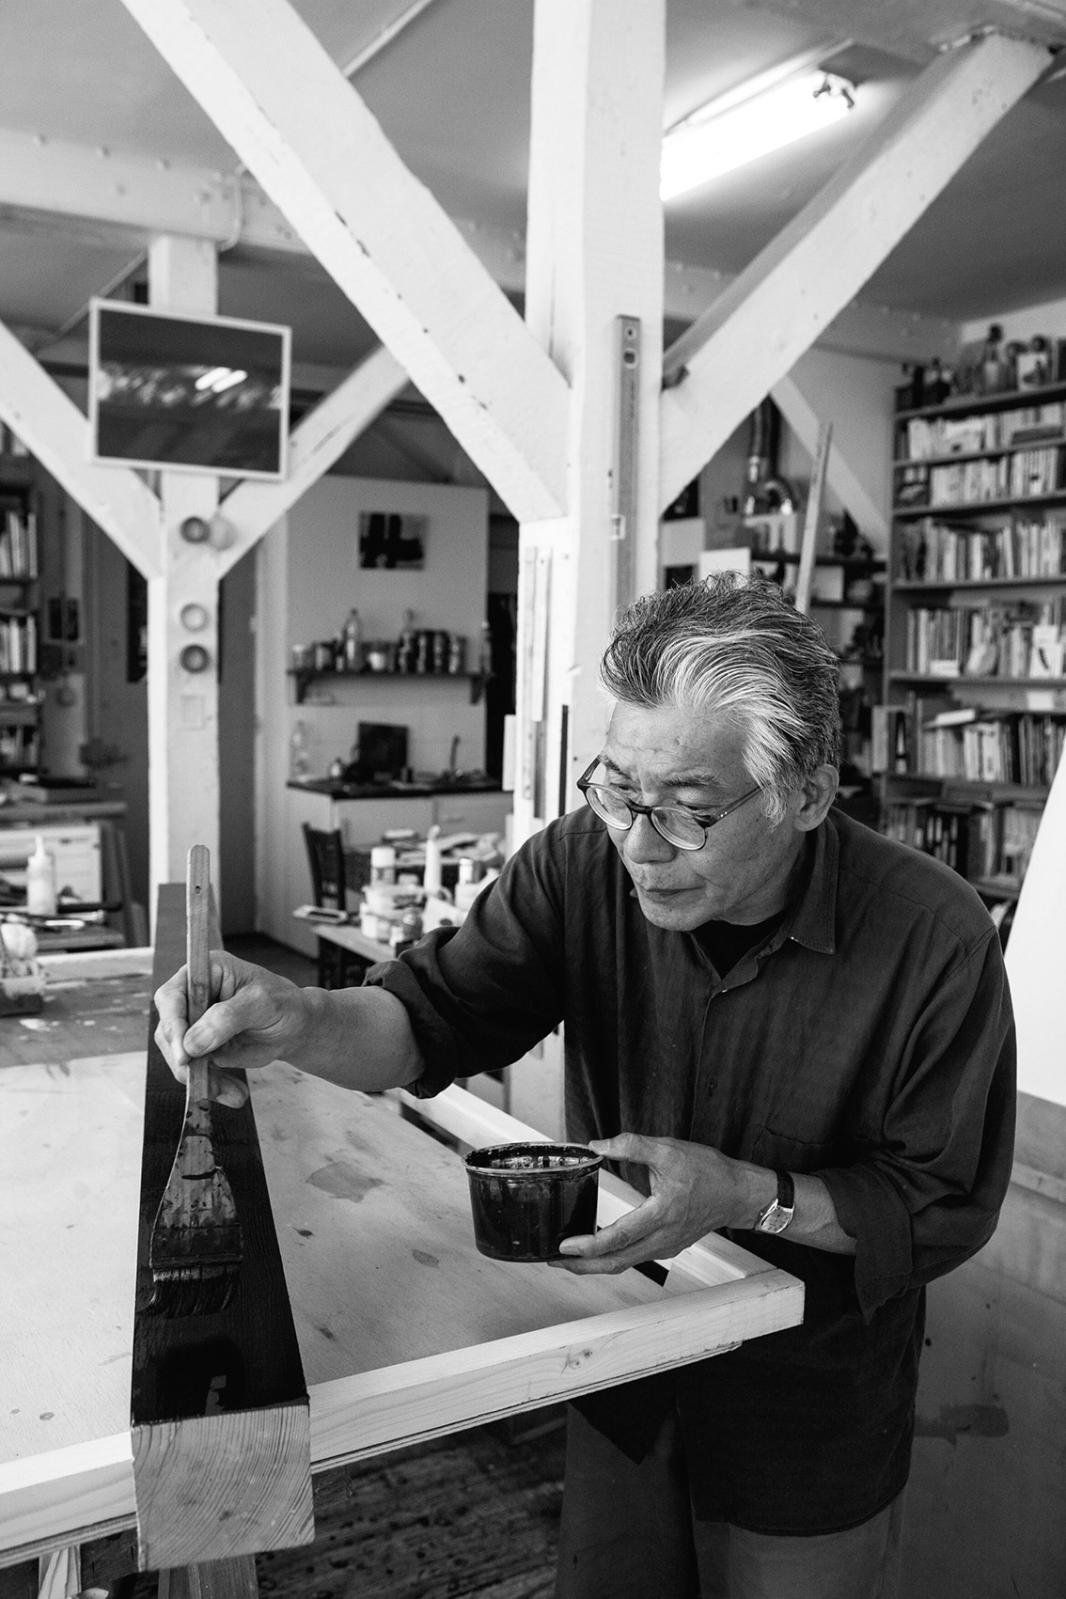 Takesada Matsutani, dans son atelier parisien. Courtesy de l'artiste et de Hauser & Wirth Photo Michel Lunardelli © Takesada Matsutani